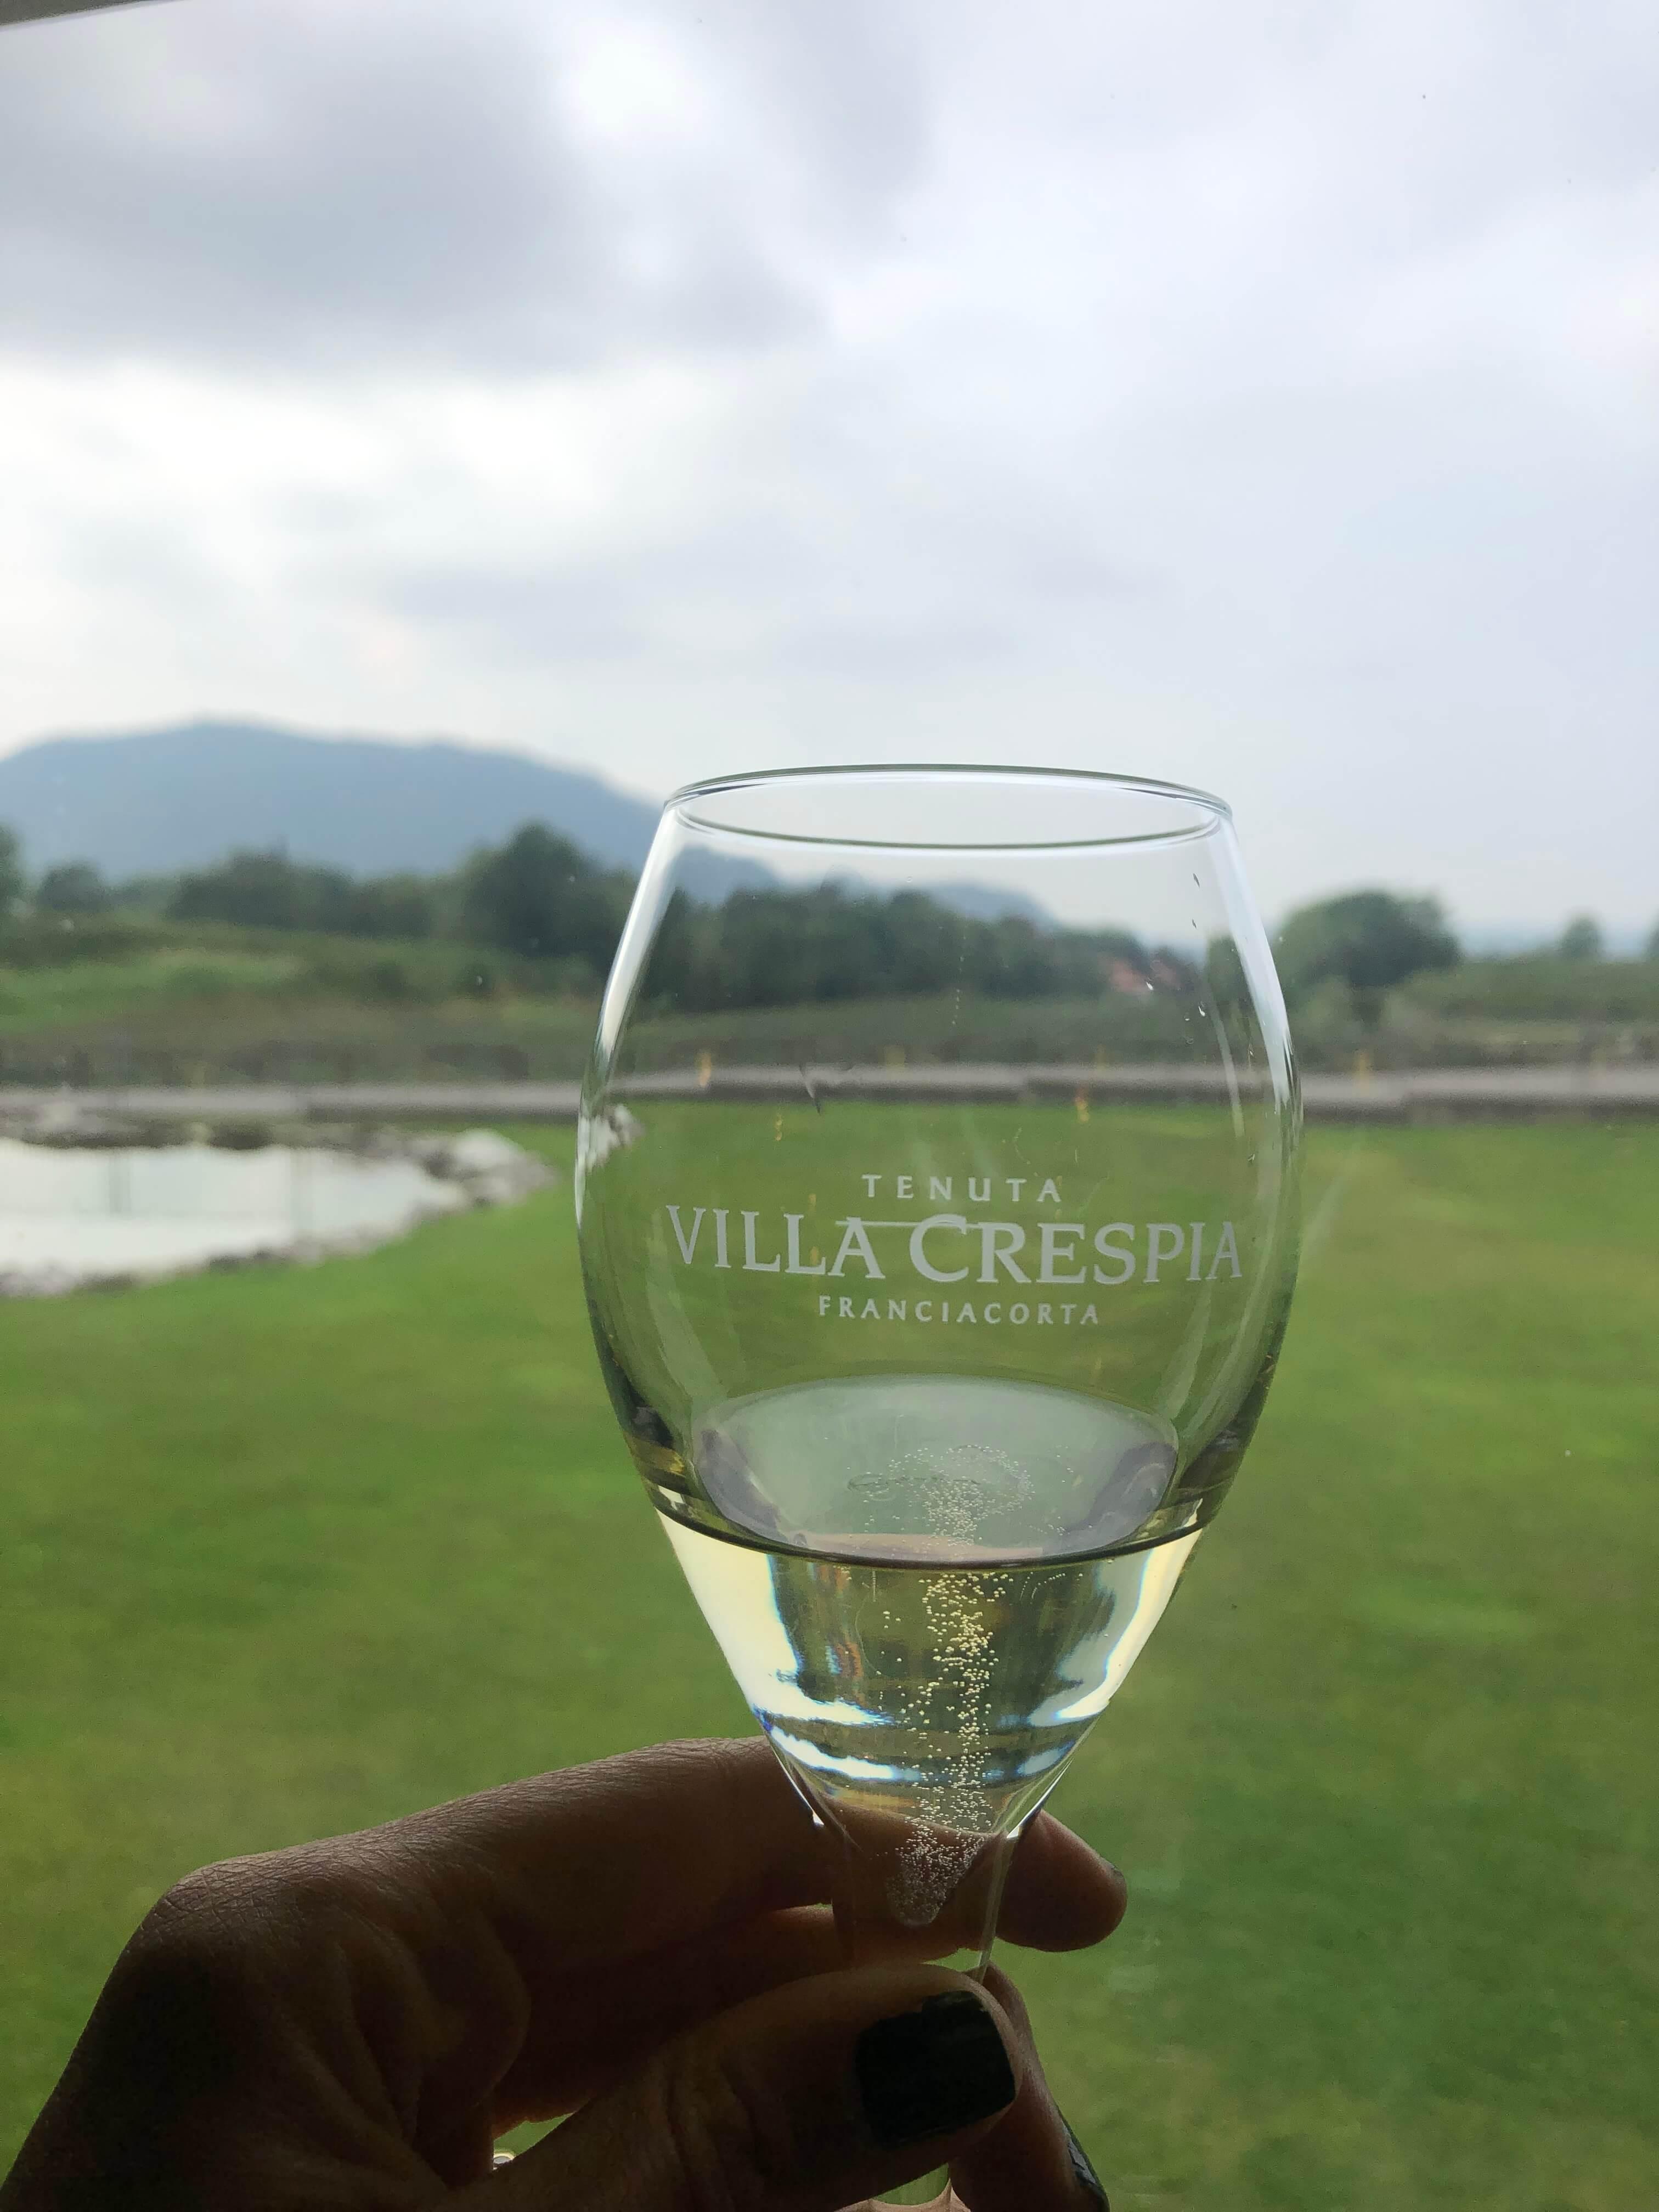 Franciacorta wine region villa crespia